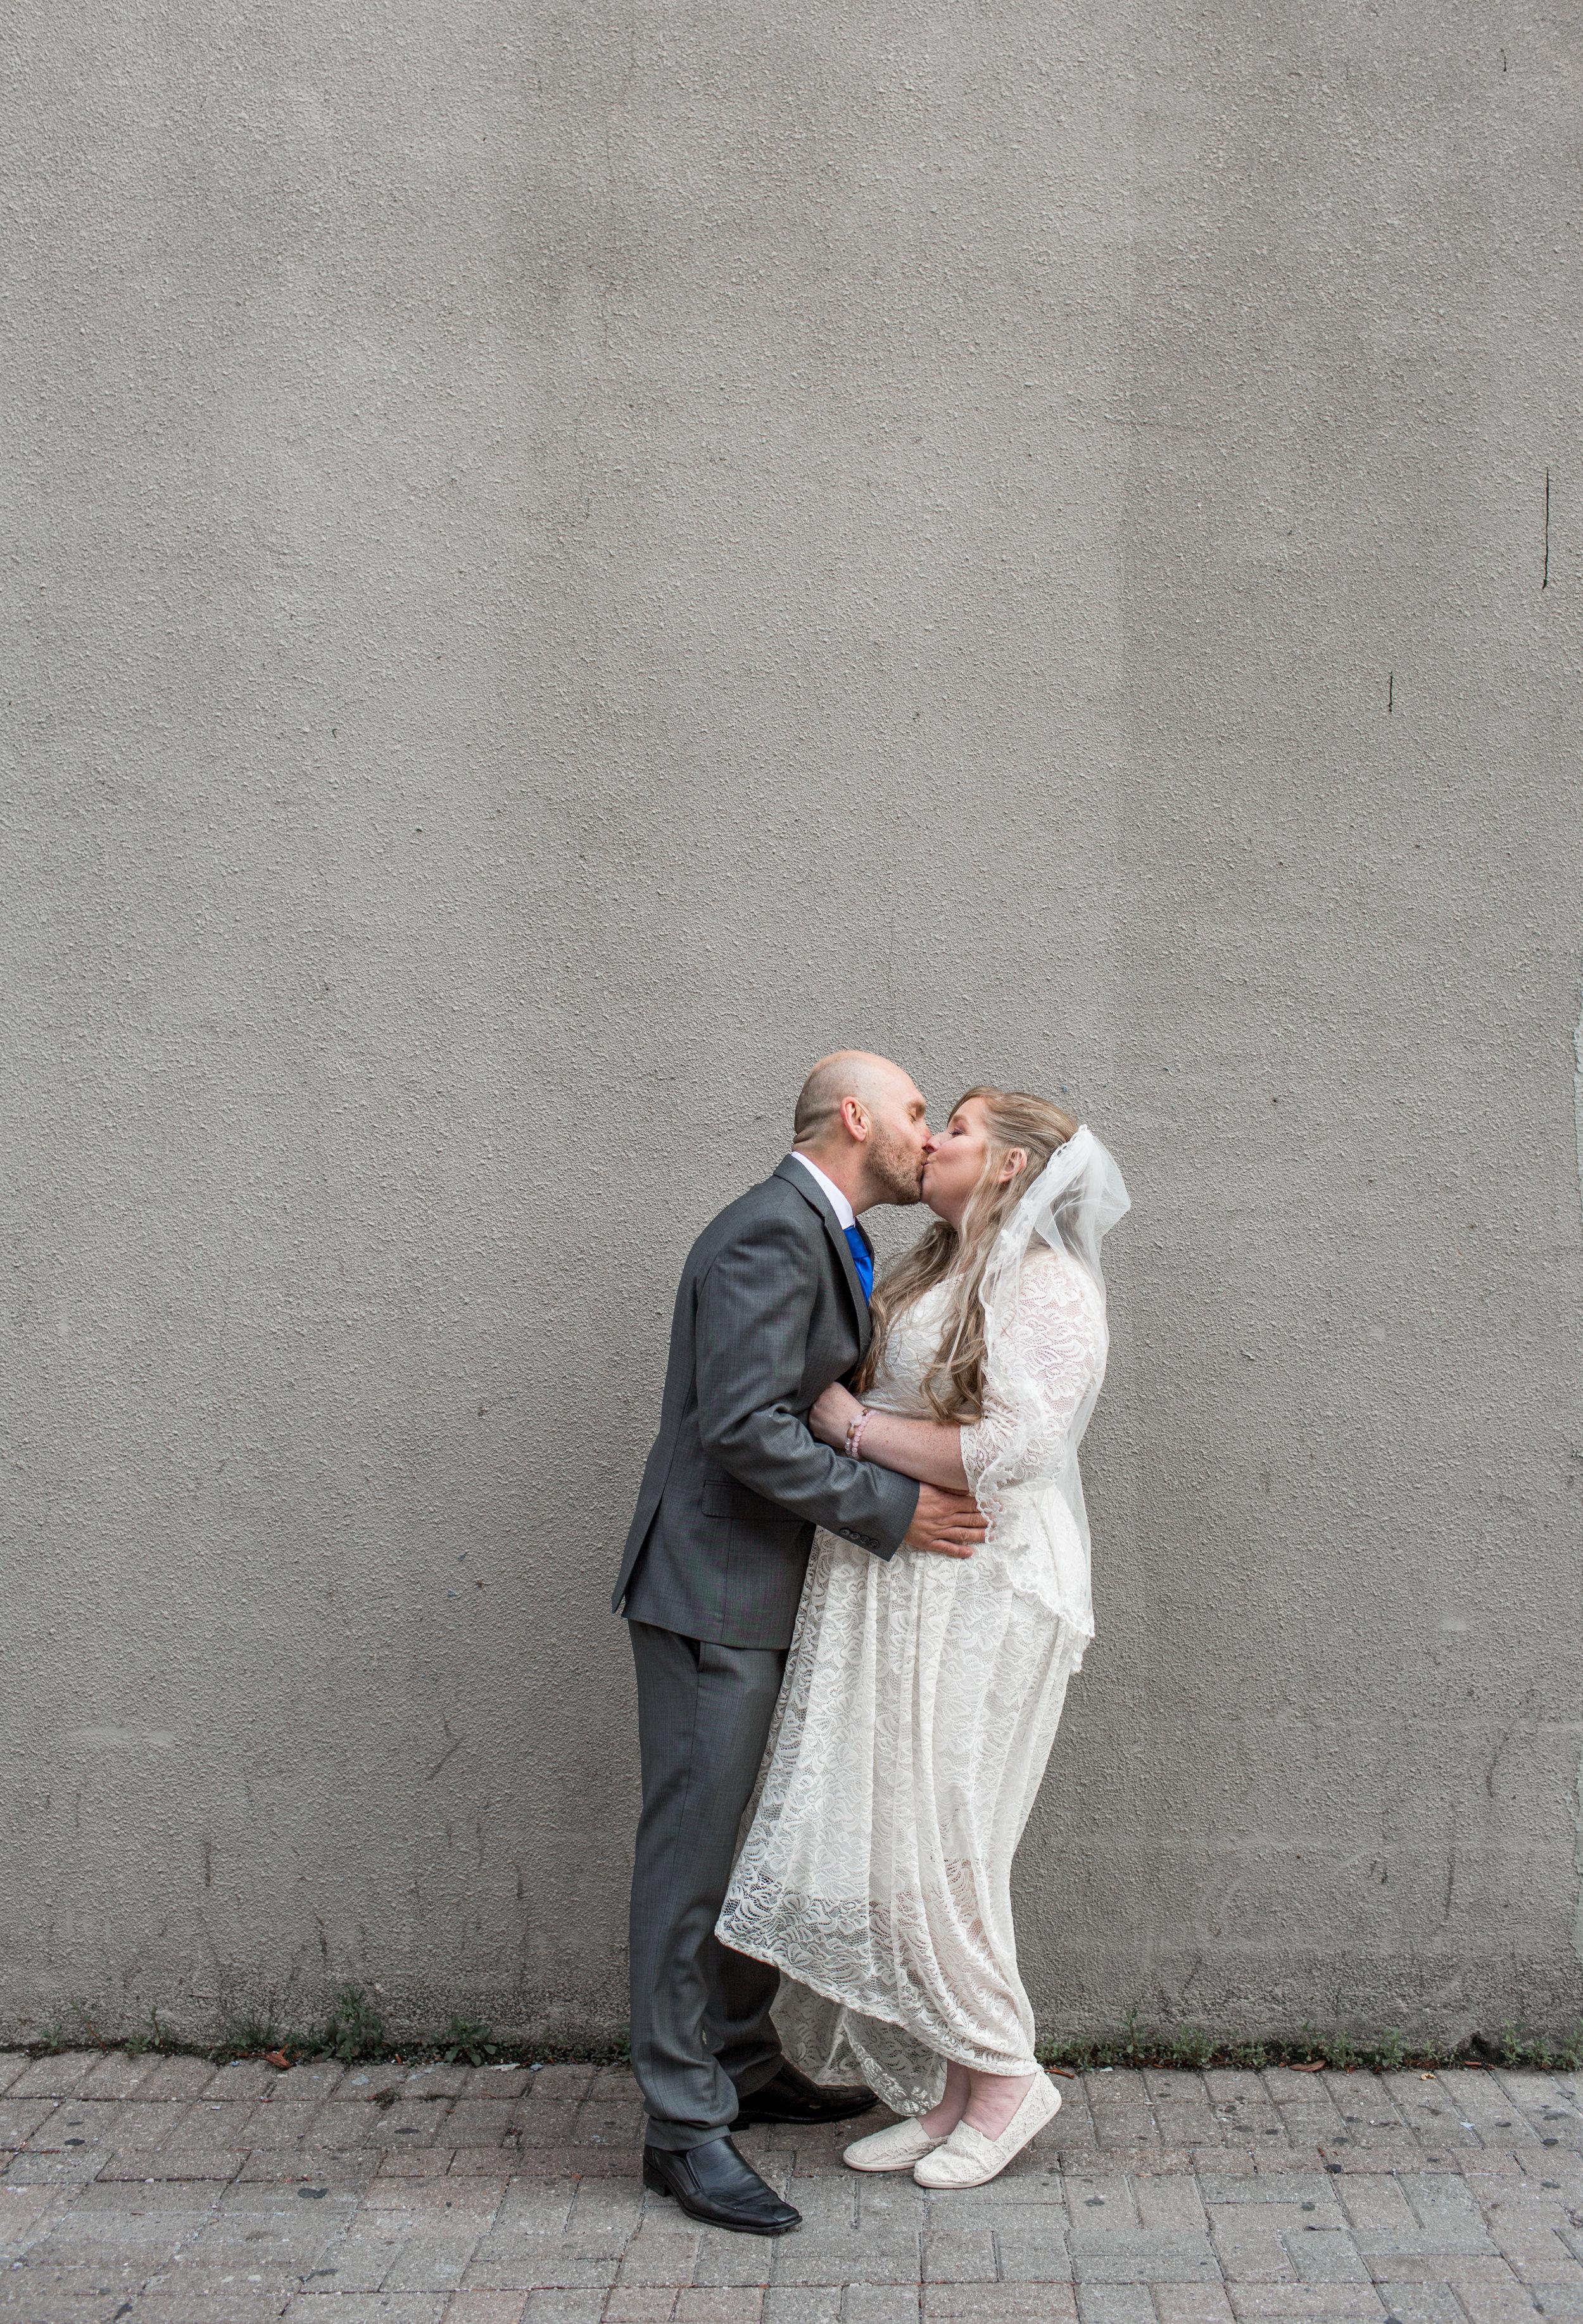 Urban Bride & Groom Photography